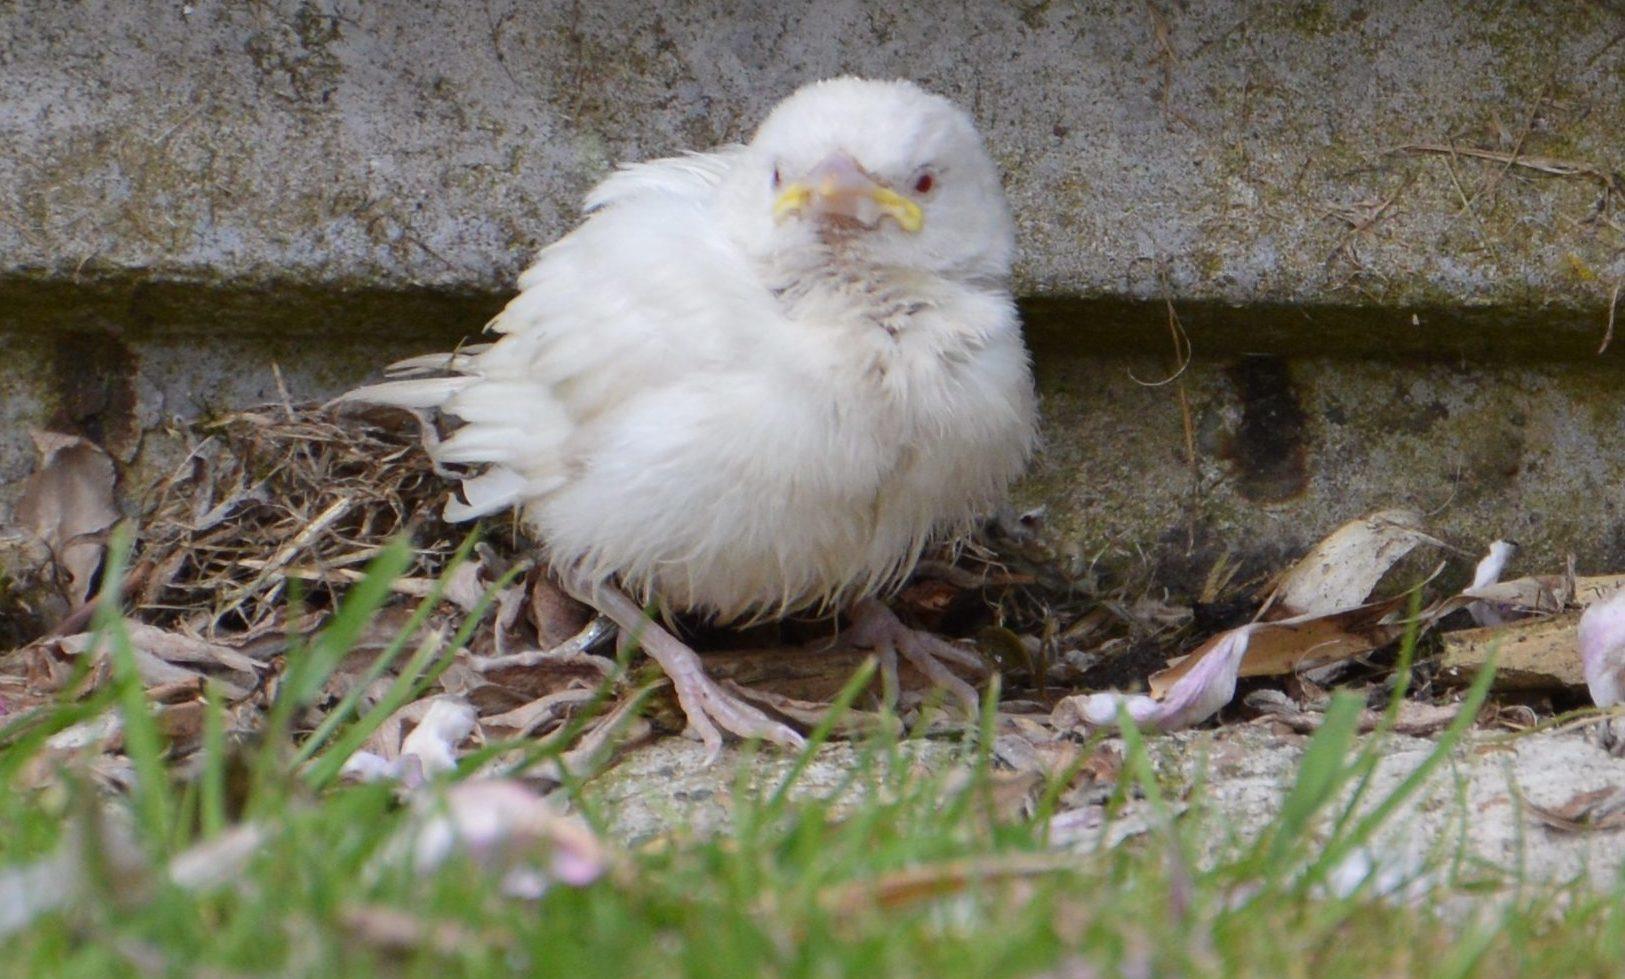 Pure white birds like the sparrow are rare.